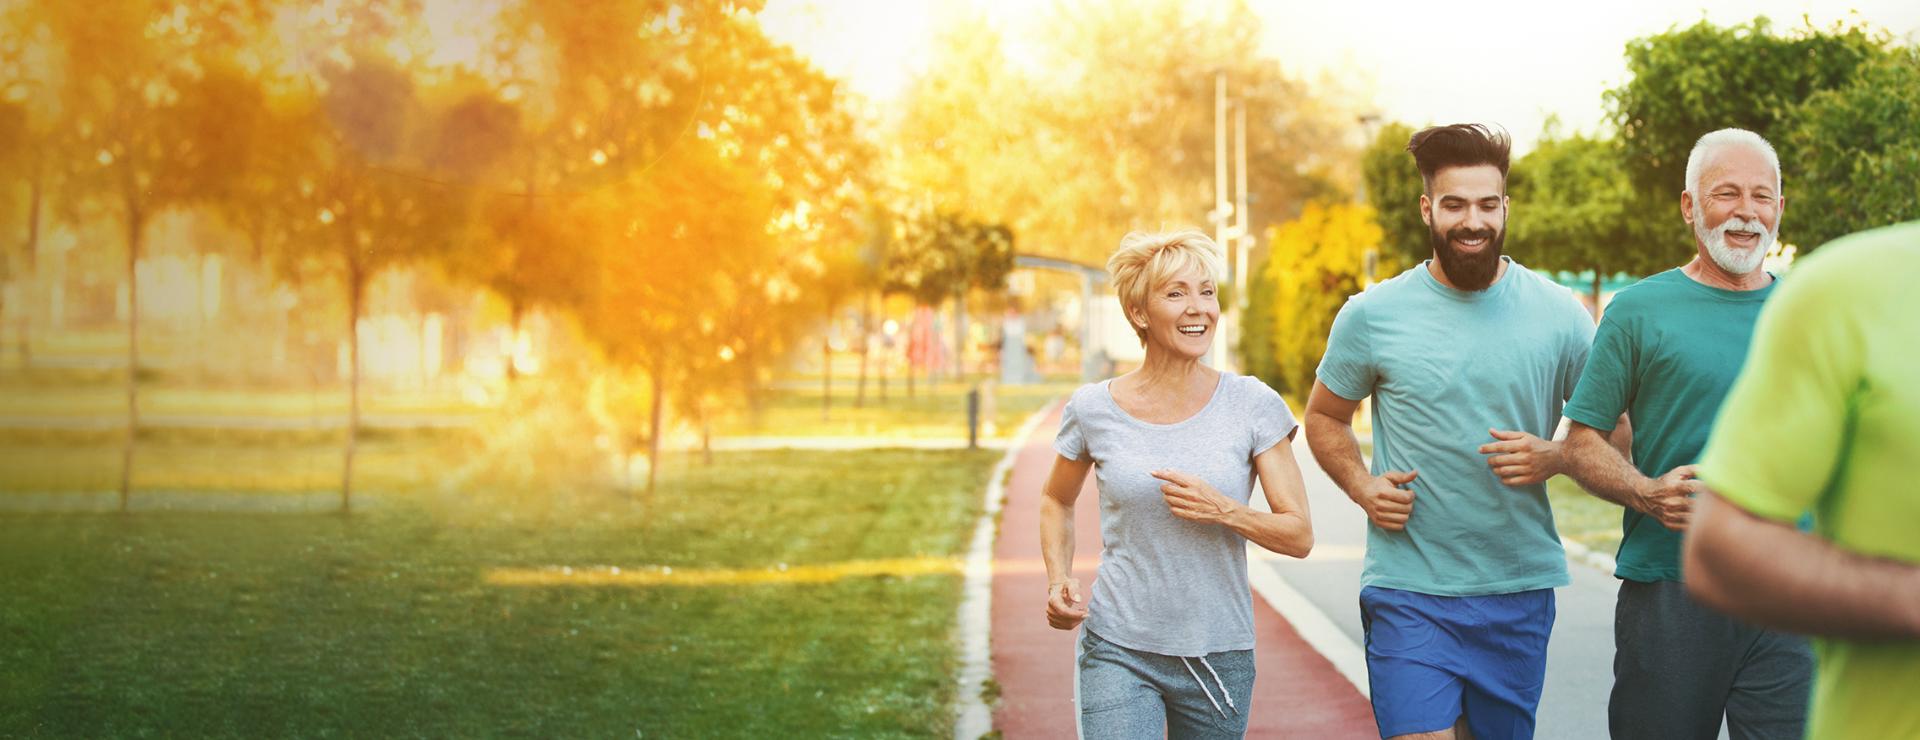 S-Patch Cardio를 통해 우리는 고품질 심전도 데이터 수집이 가능했고, 더 정확하고 빠르게 환자의 심질환 상태를 진단할 수 있었습니다